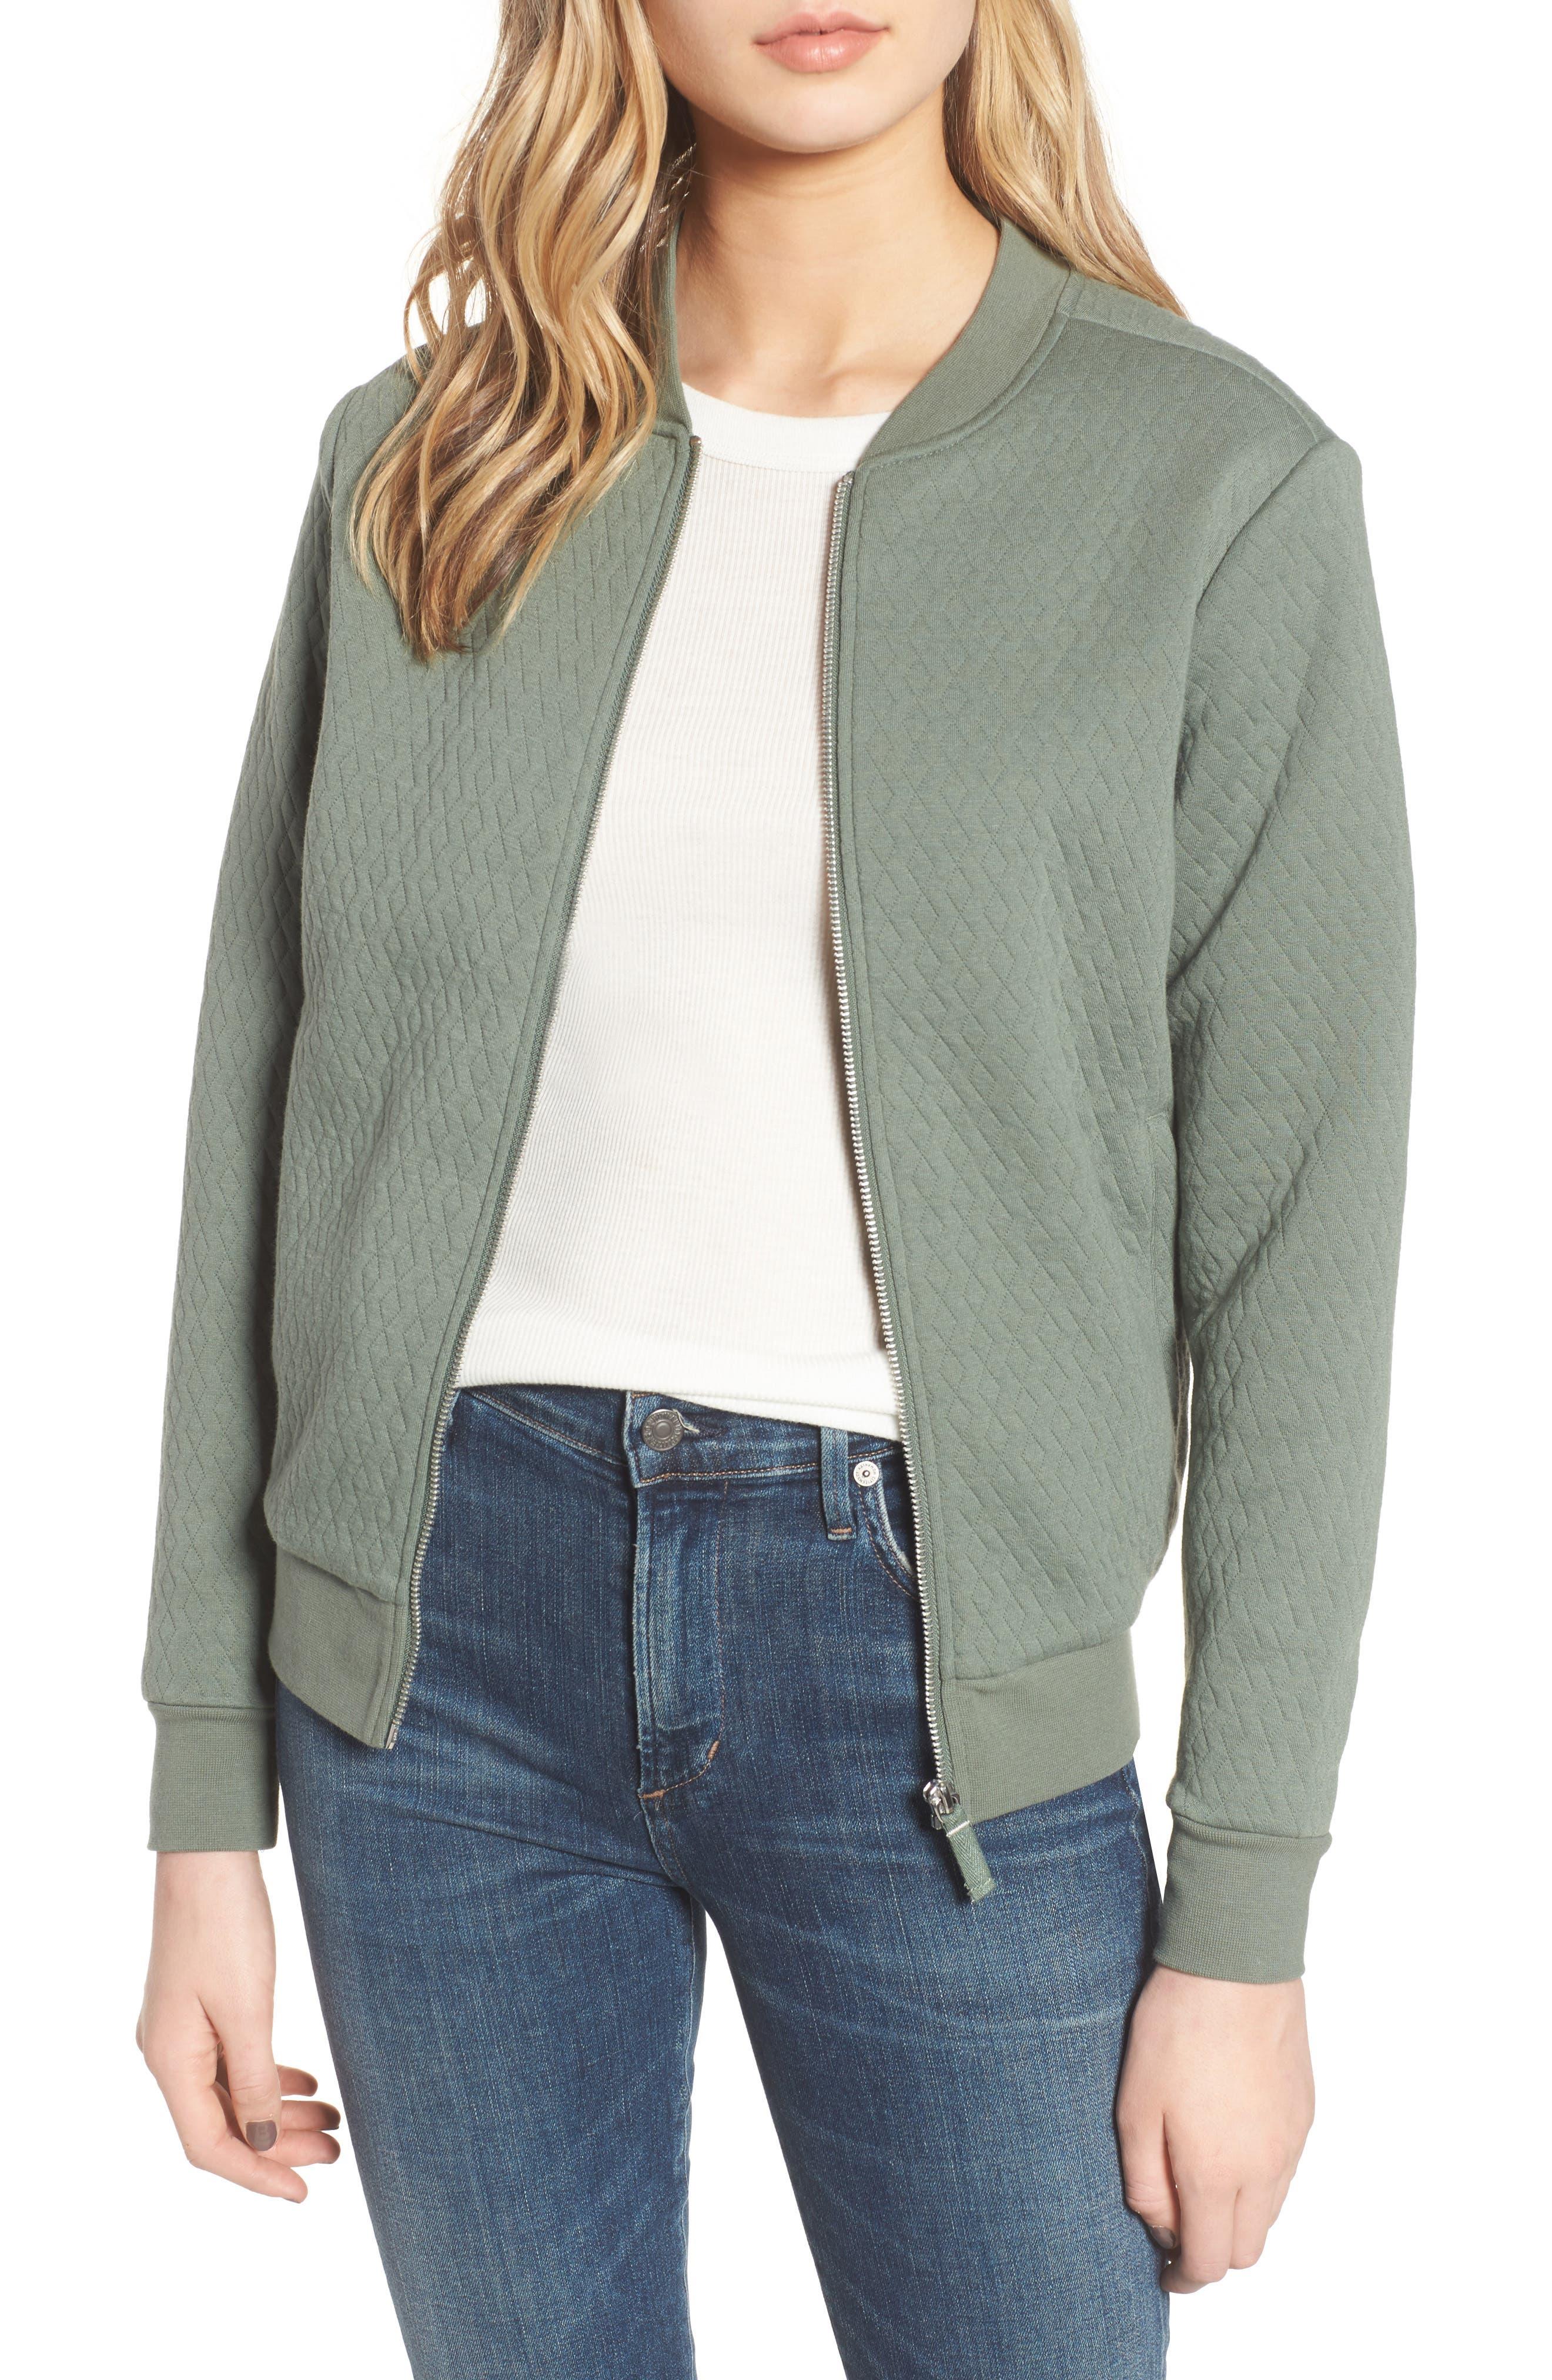 Millie Bomber Sweatshirt Jacket,                             Main thumbnail 1, color,                             301